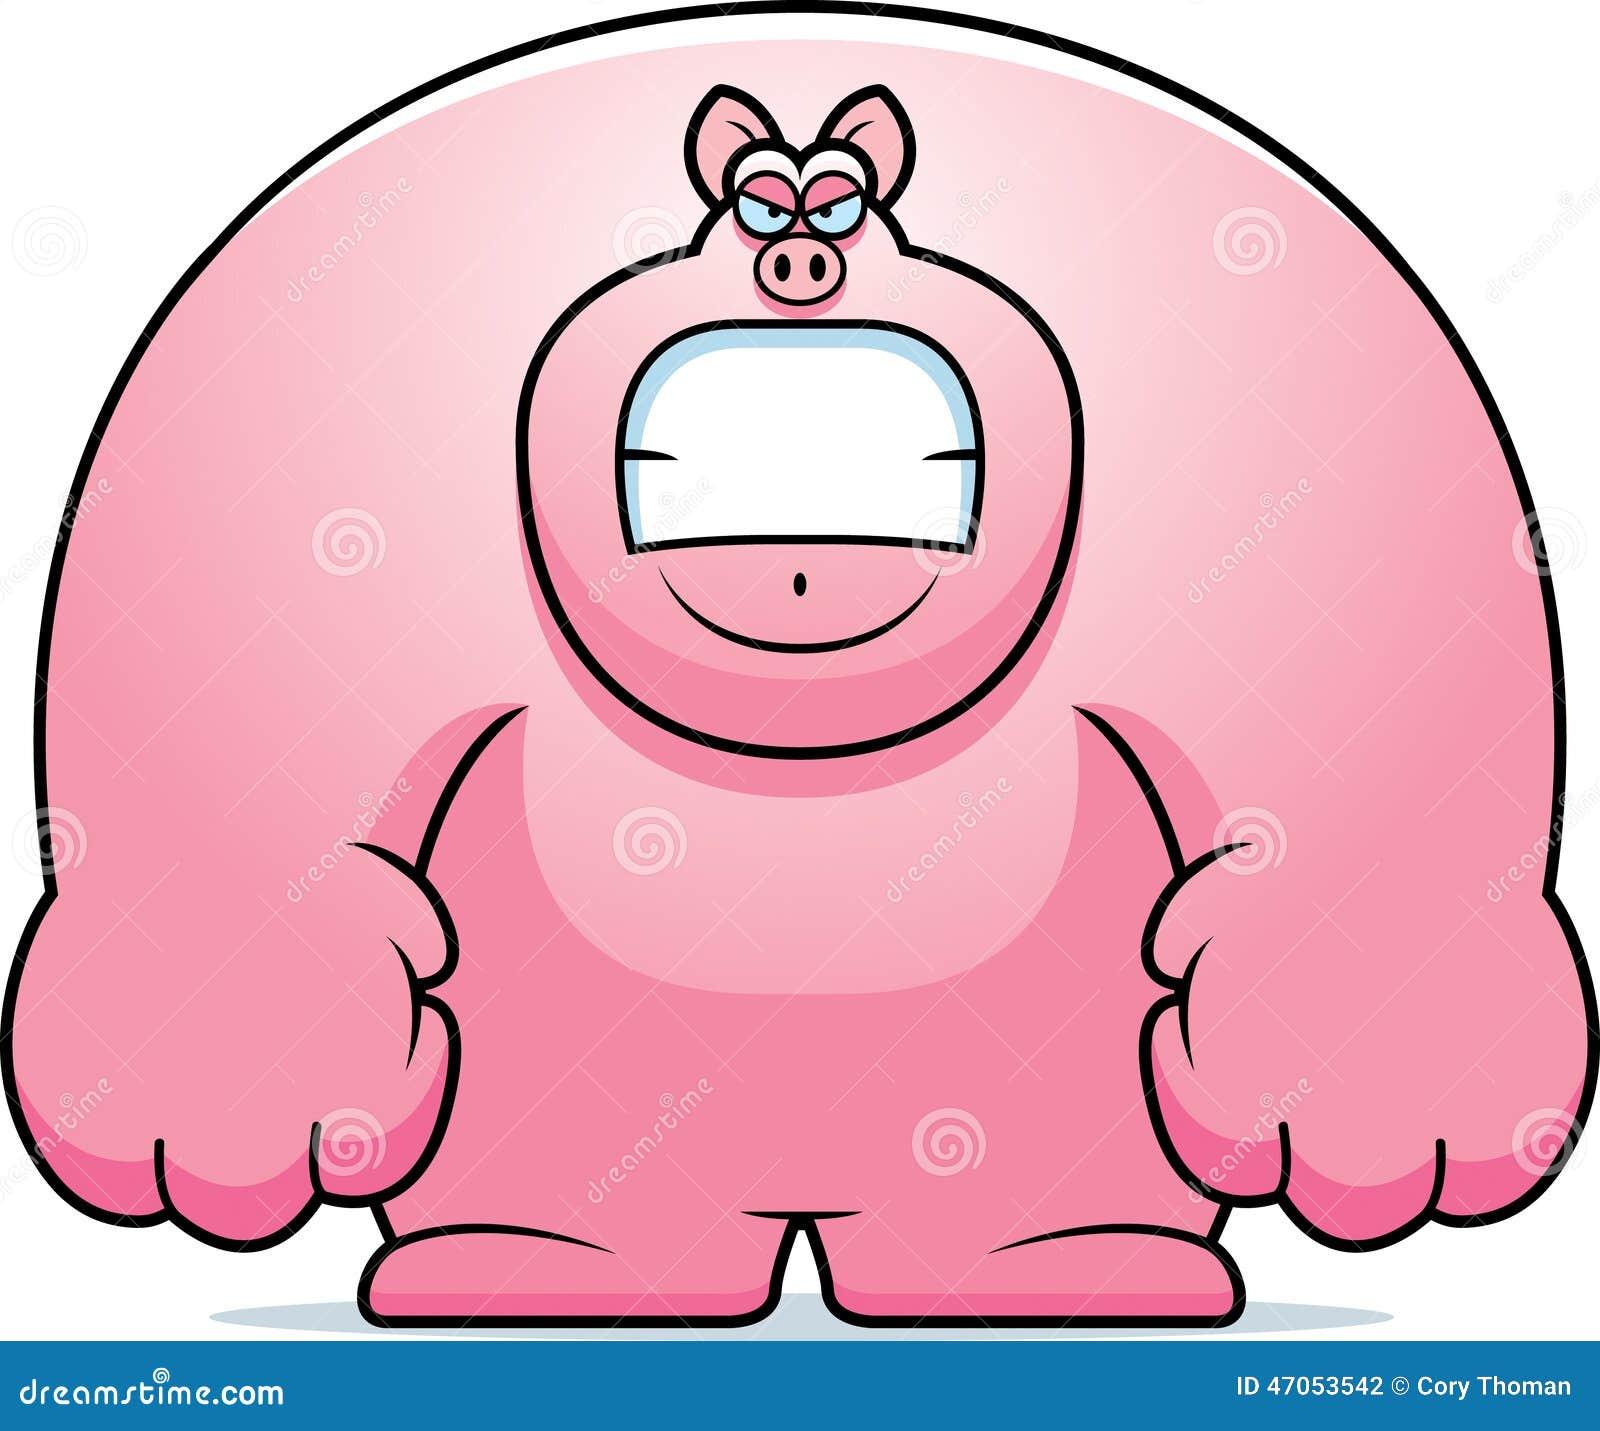 Angry Cartoon Pig Stock Vector - Image: 47053542